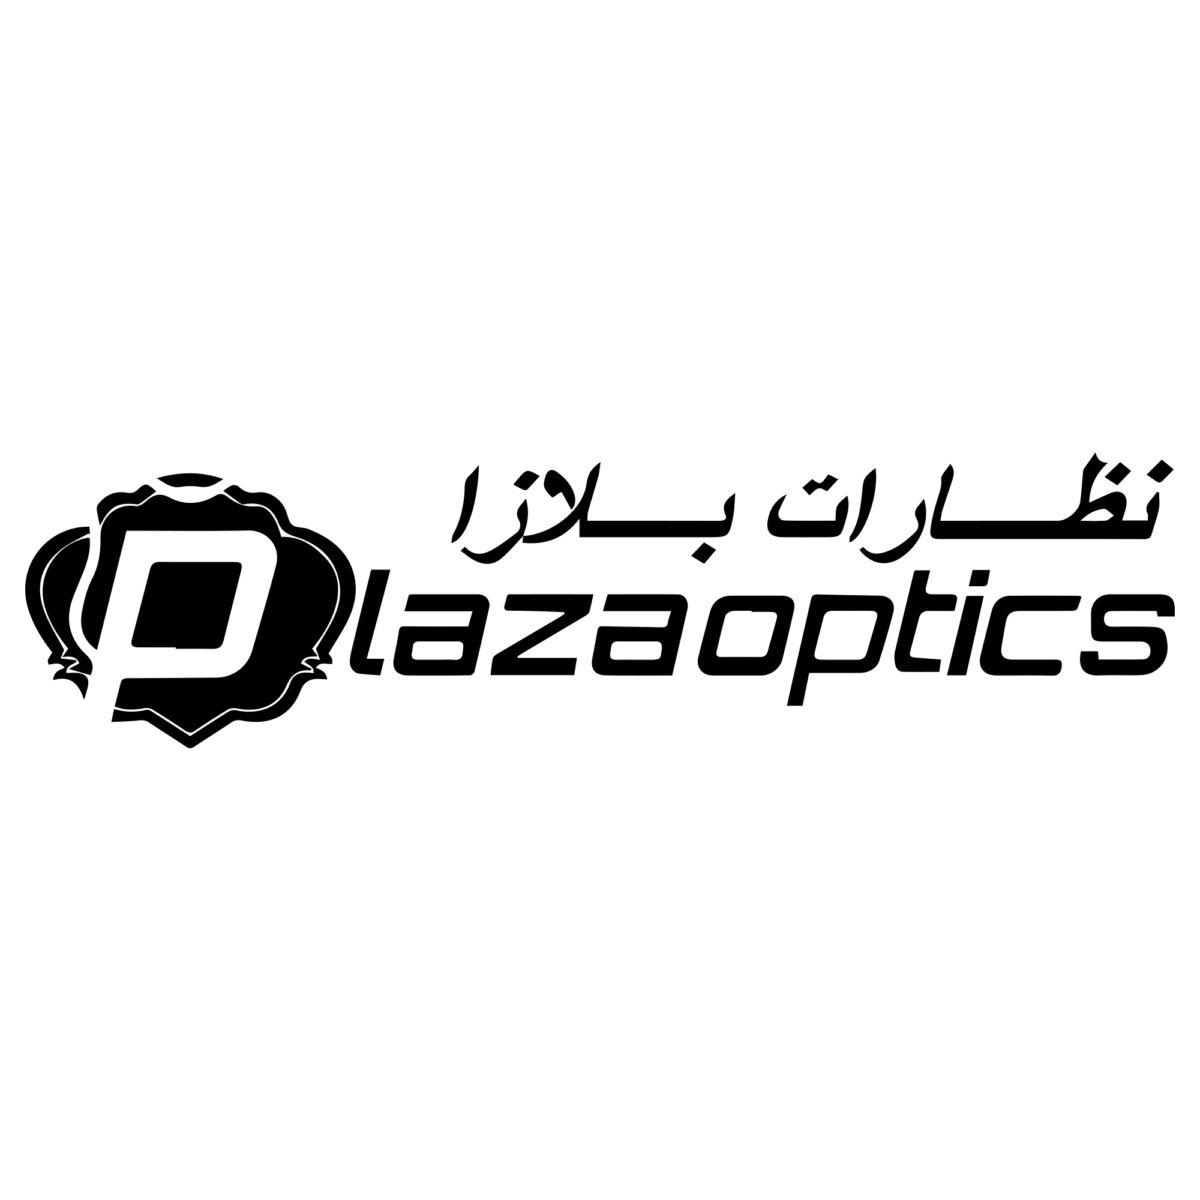 Plaza Optics